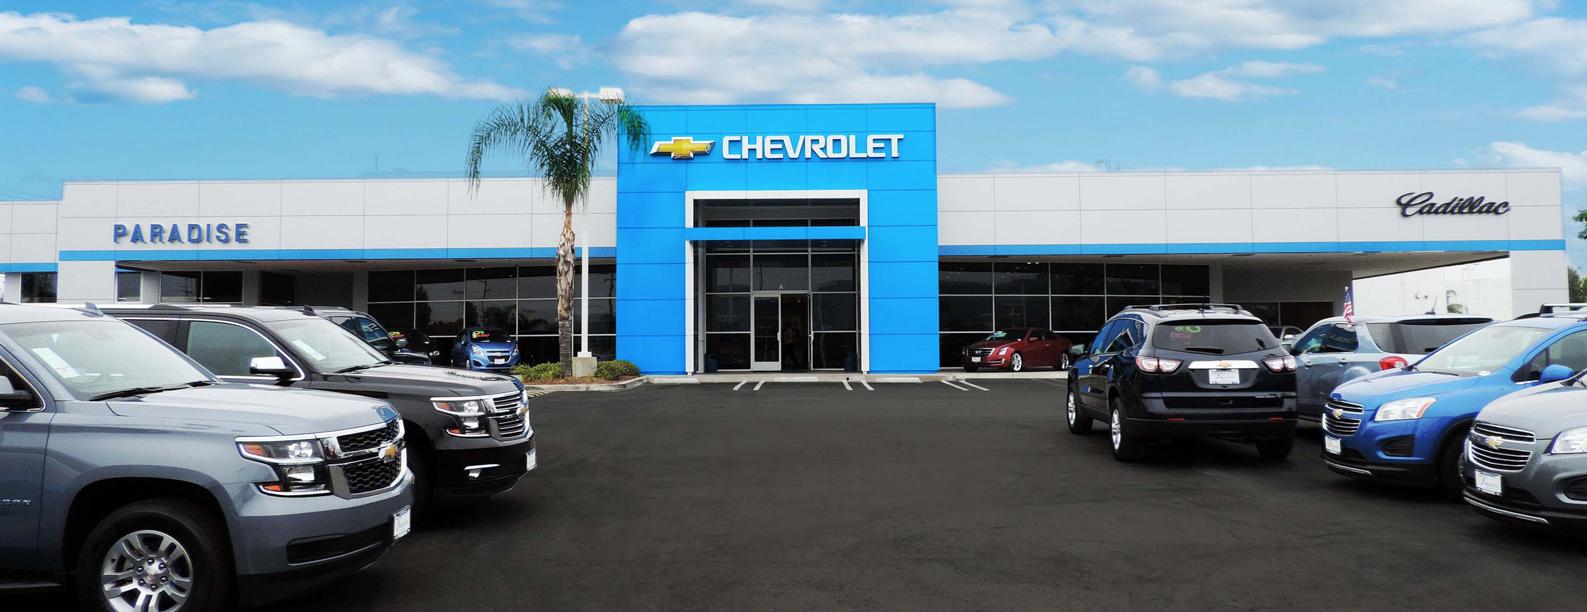 Paradise Chevrolet-Cadillac